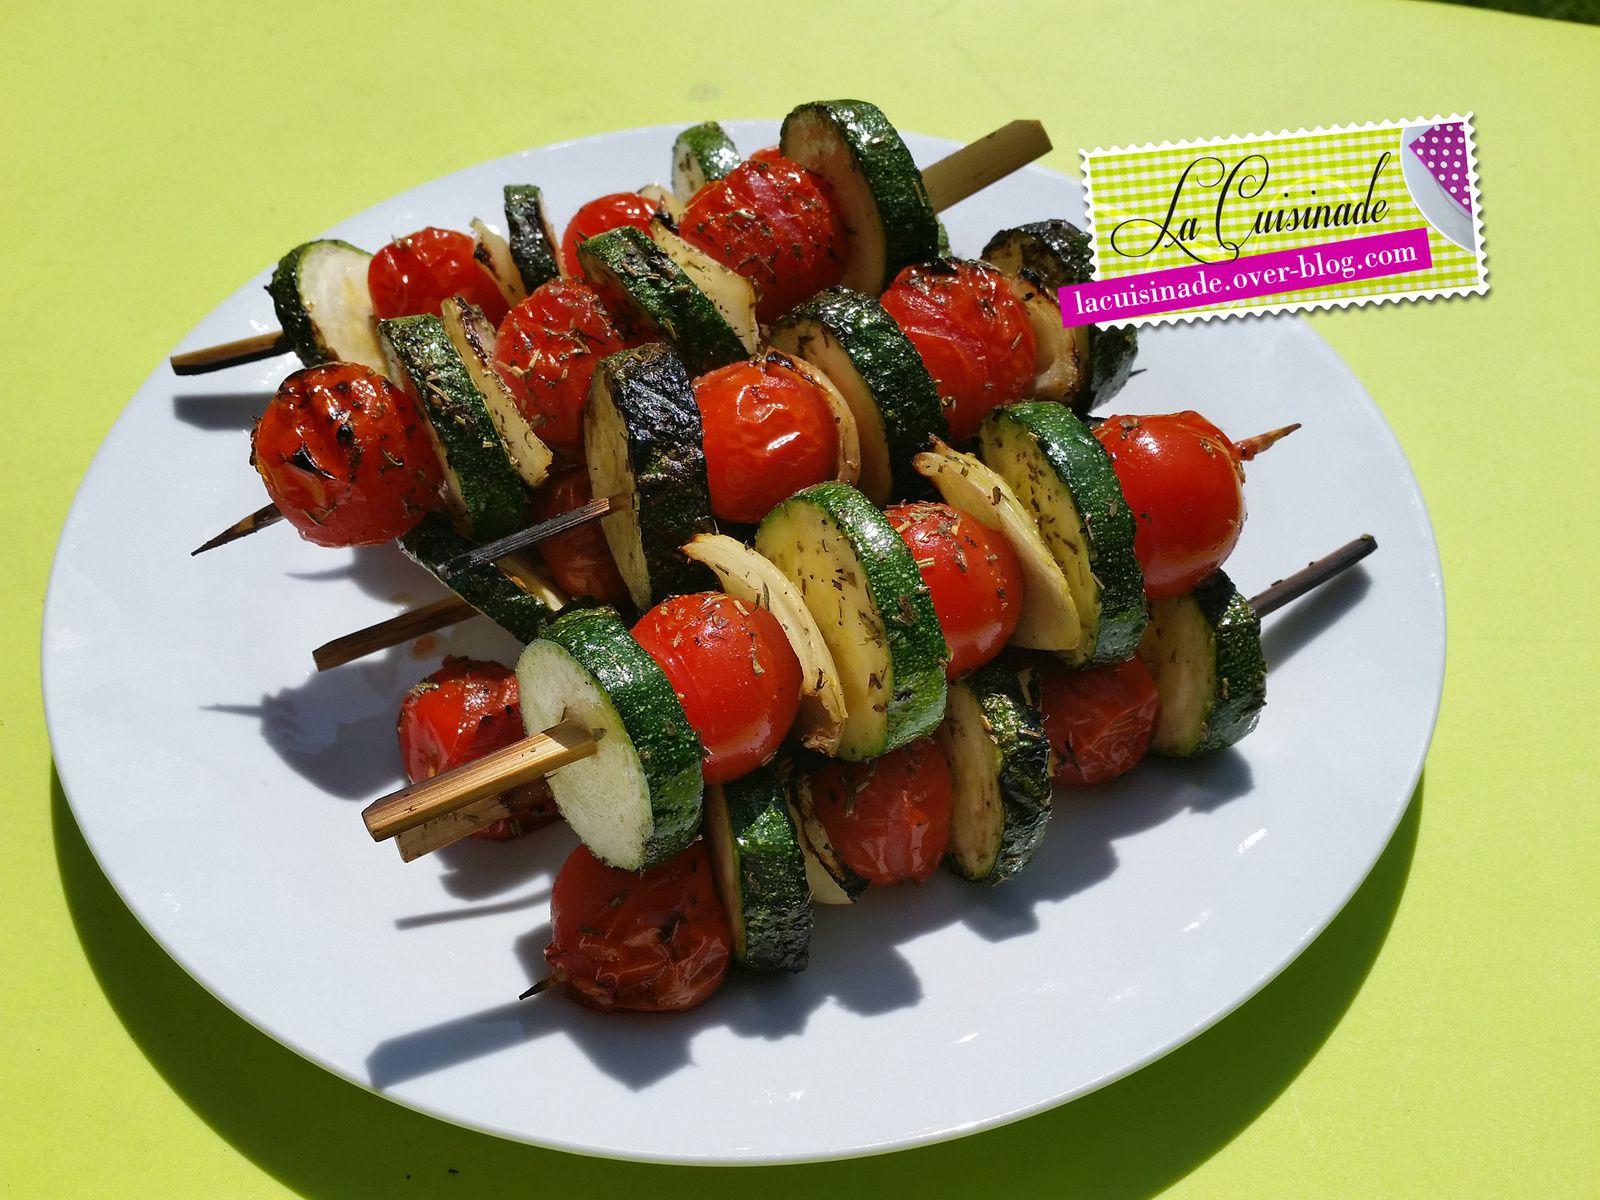 Brochettes de l gumes la cuisinade - Accompagnement poisson grille barbecue ...